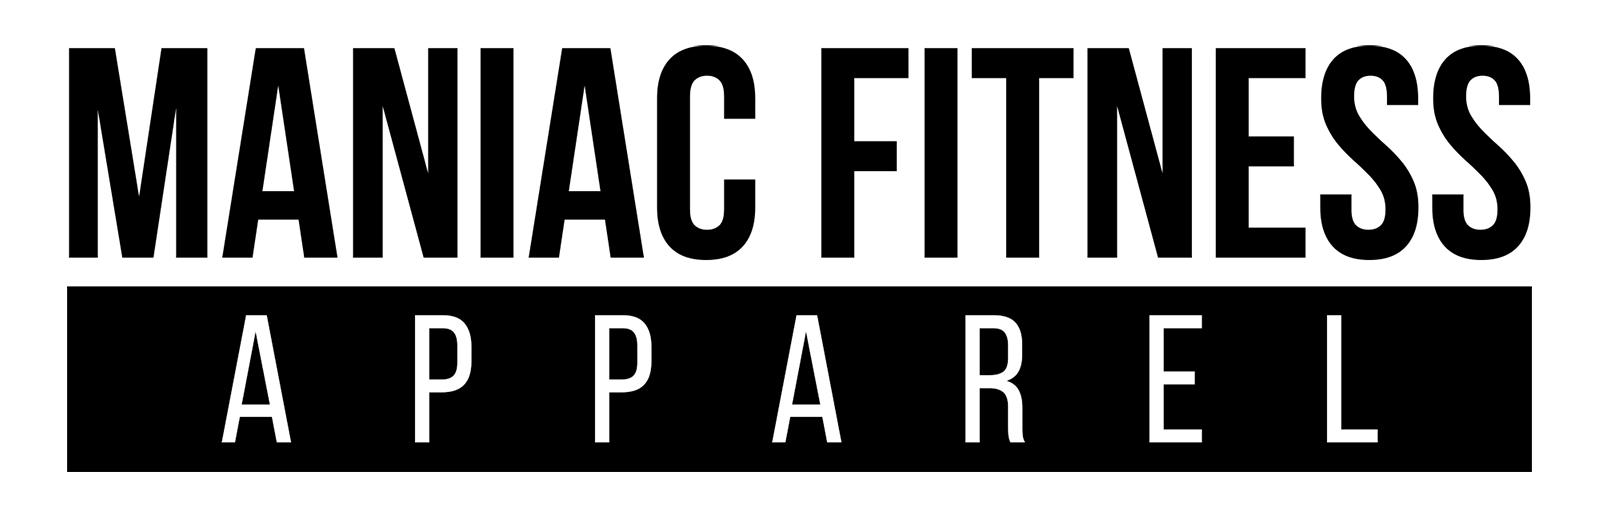 Maniac Fitness Apparel Store